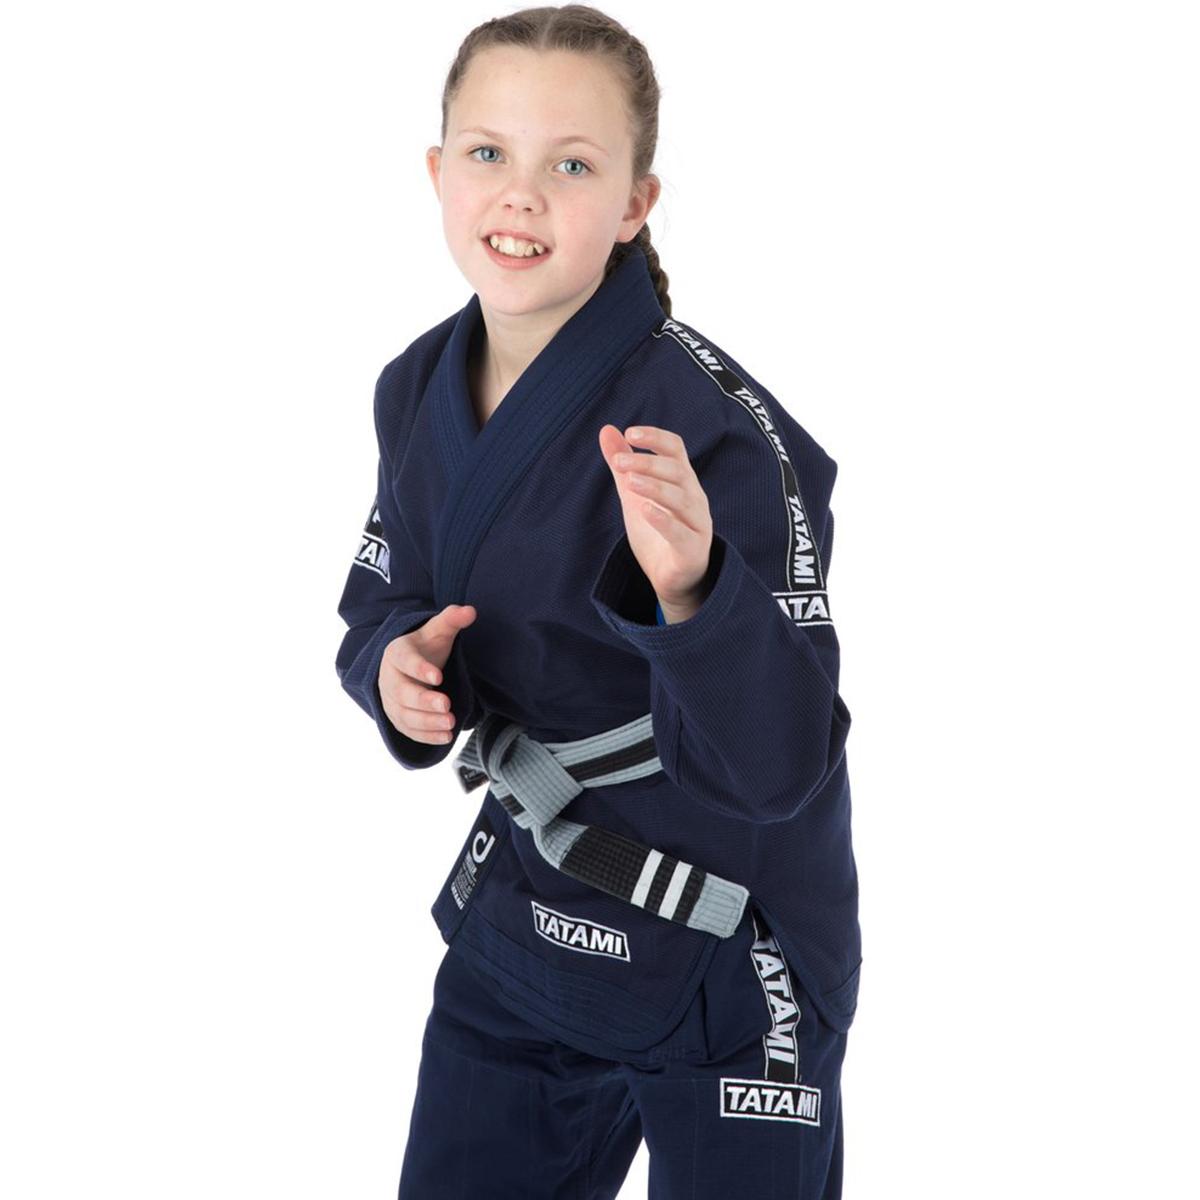 Leisurewear MMA Tatami Fightwear Kids Balance T-Shirt Workout Jiu Jitsu Casual wear BJJ Gym 100/% Cotton Grappling